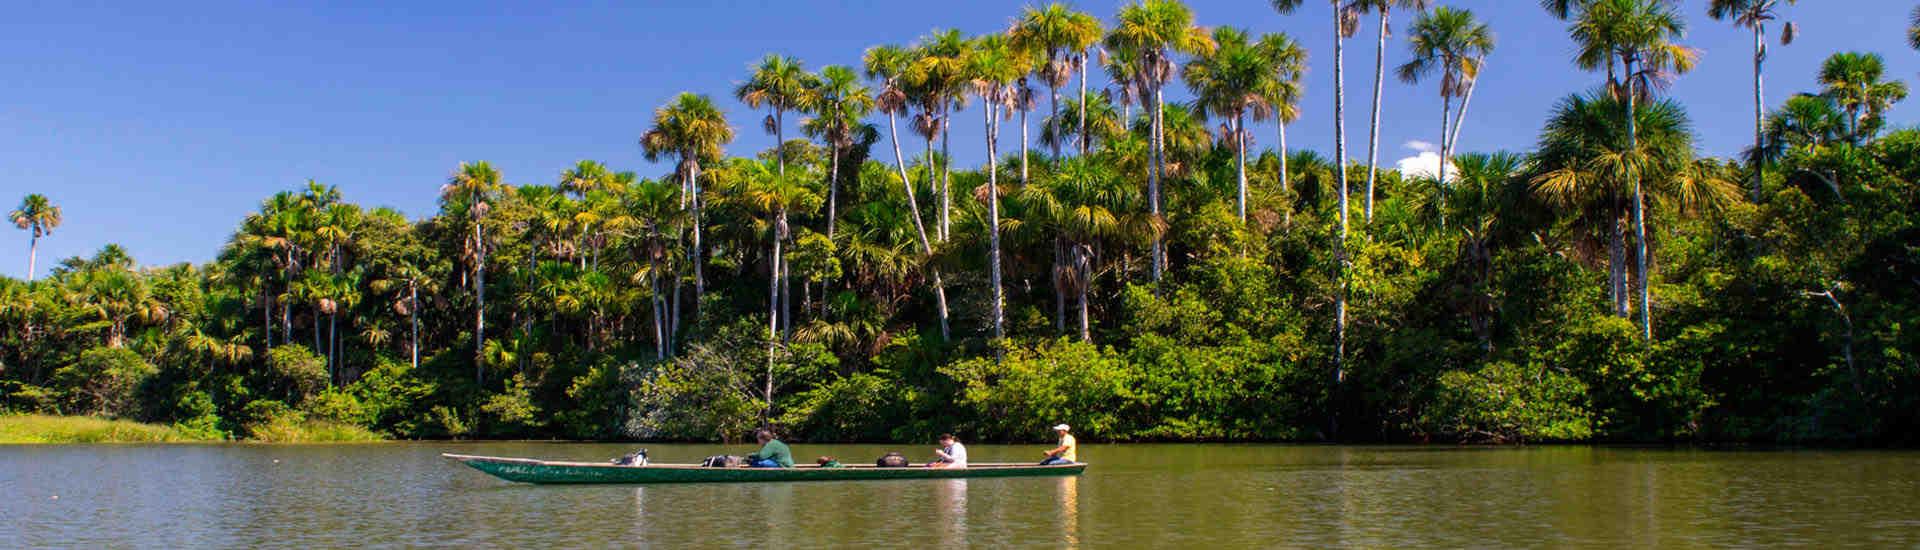 lago sandoval collpa palmeras toursperumachupicchu